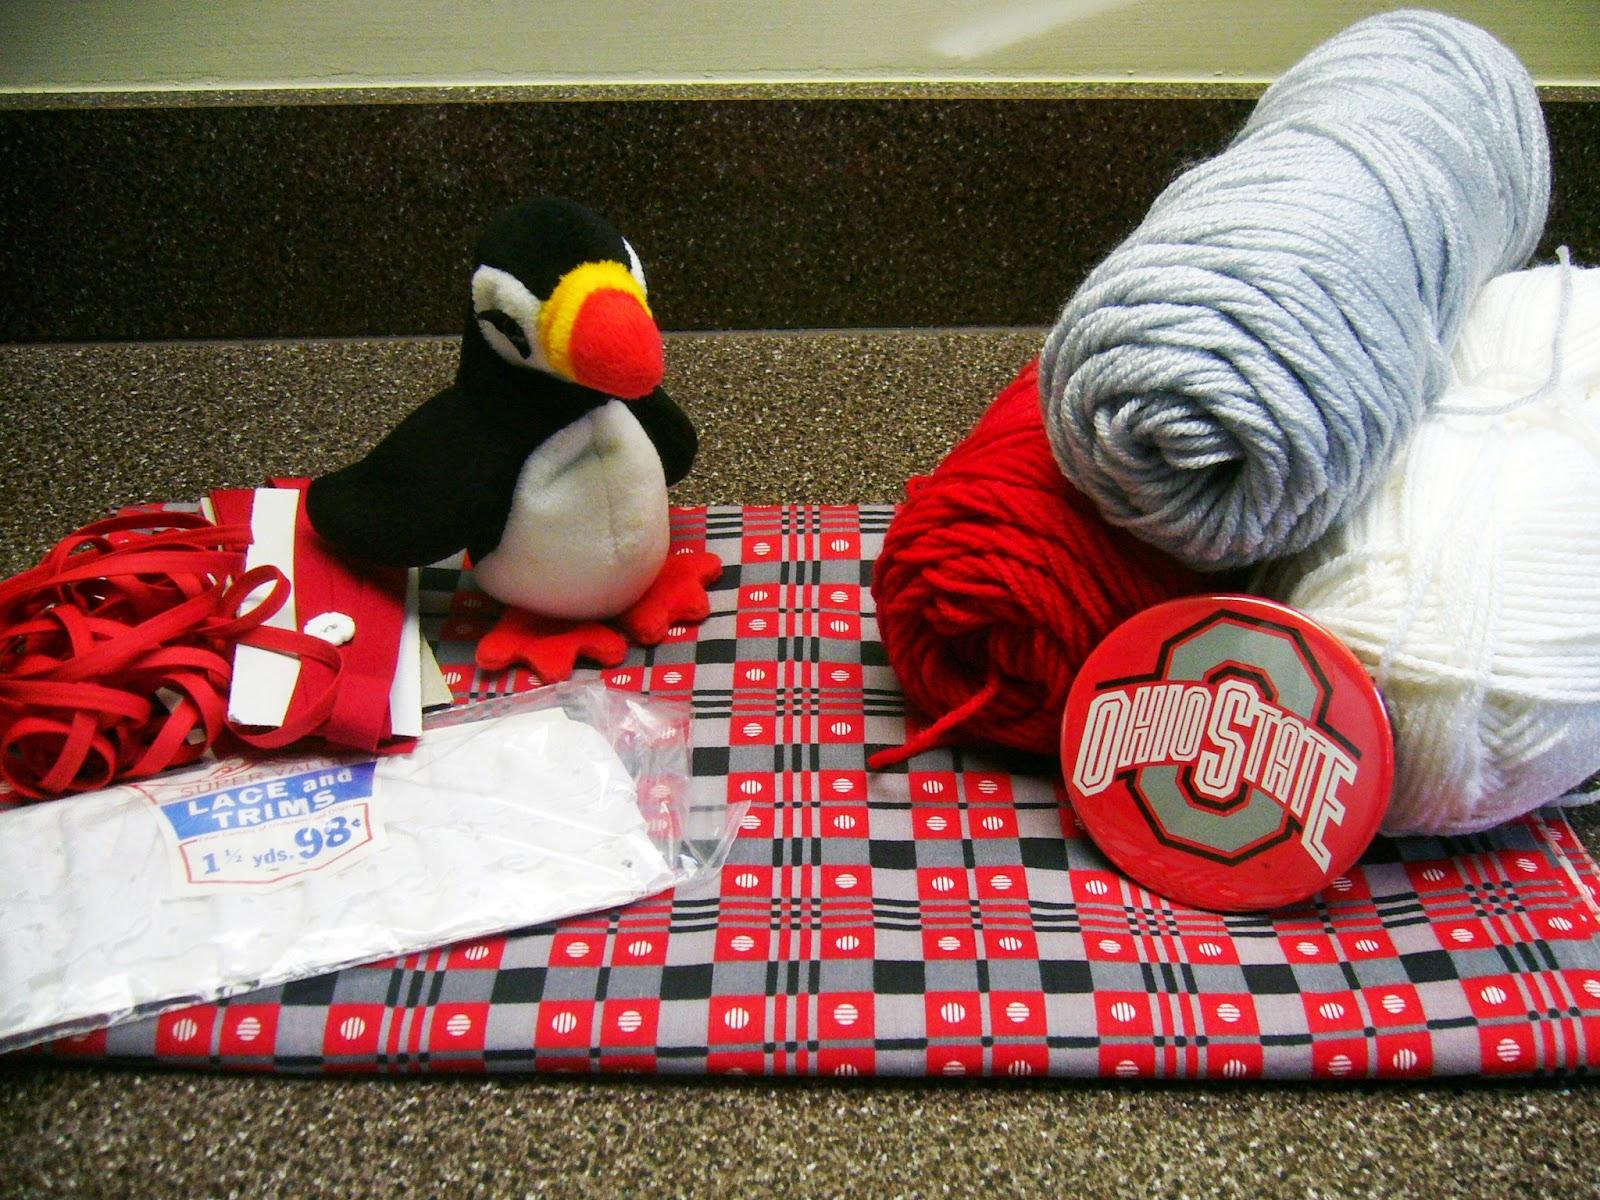 The Ohio State Buckeyes Shoe Box Crafting Supplies